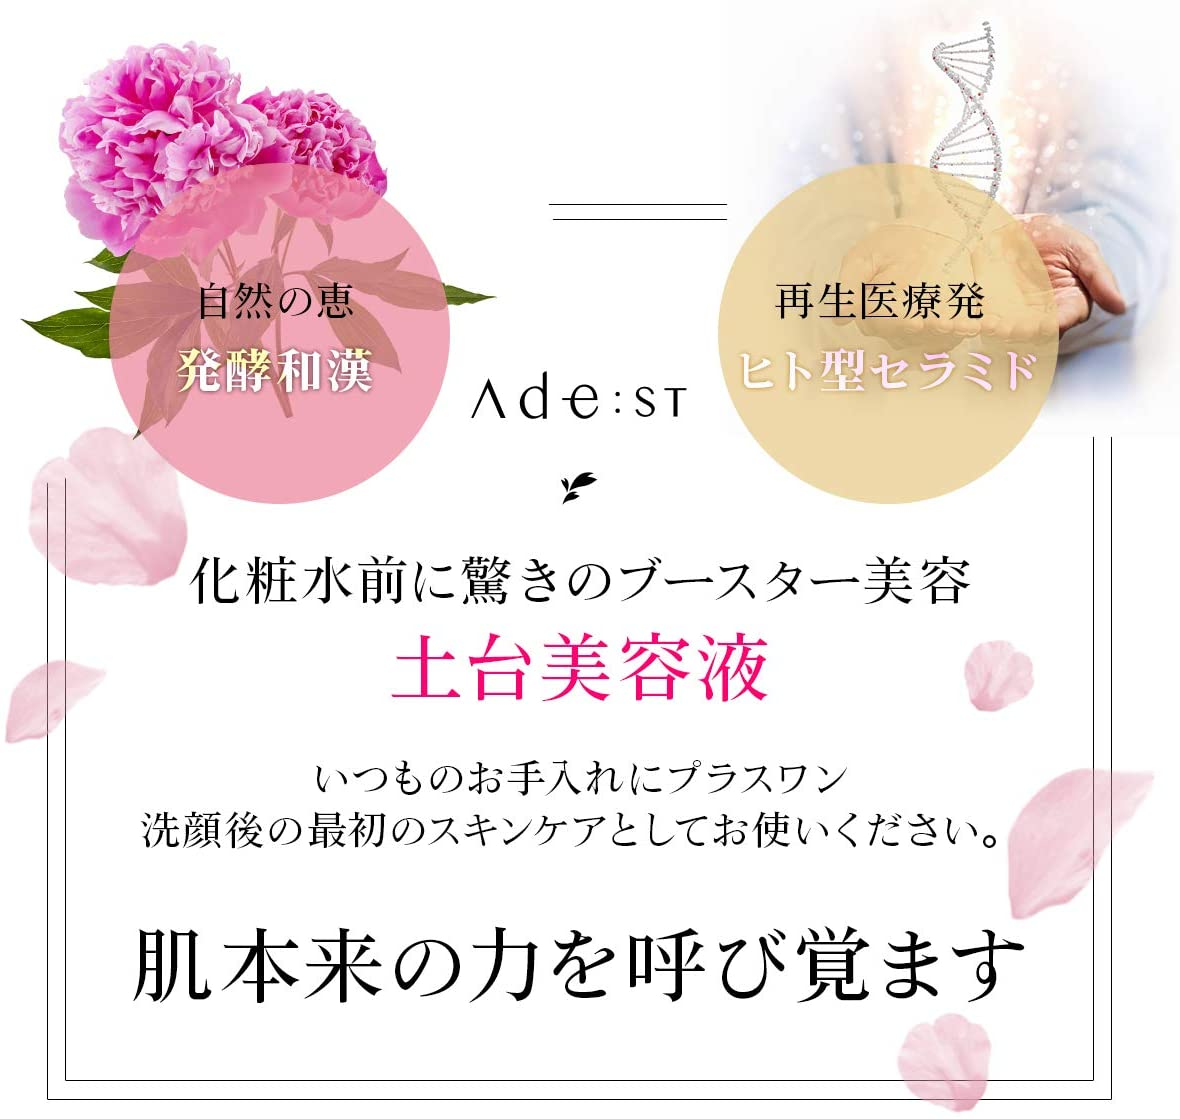 Ade:ST concentrate SERUM 新型ビタミン誘導体APPS 配合美容液